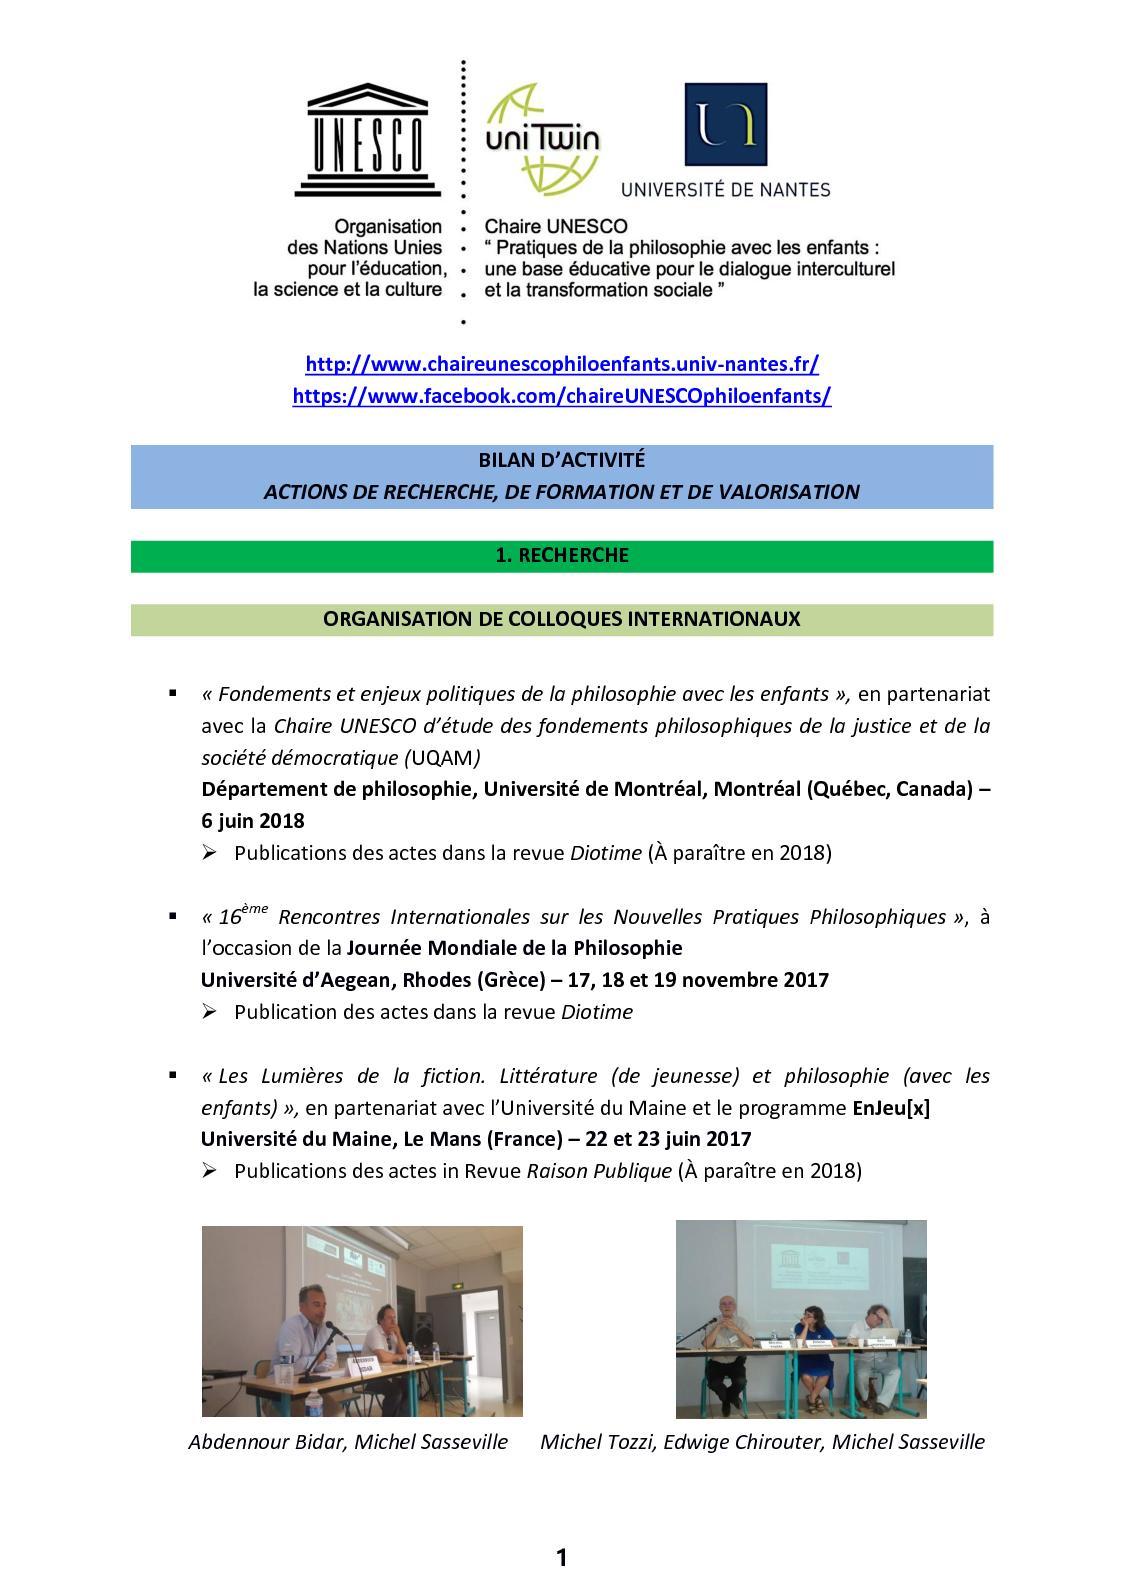 rencontres internationales image et science